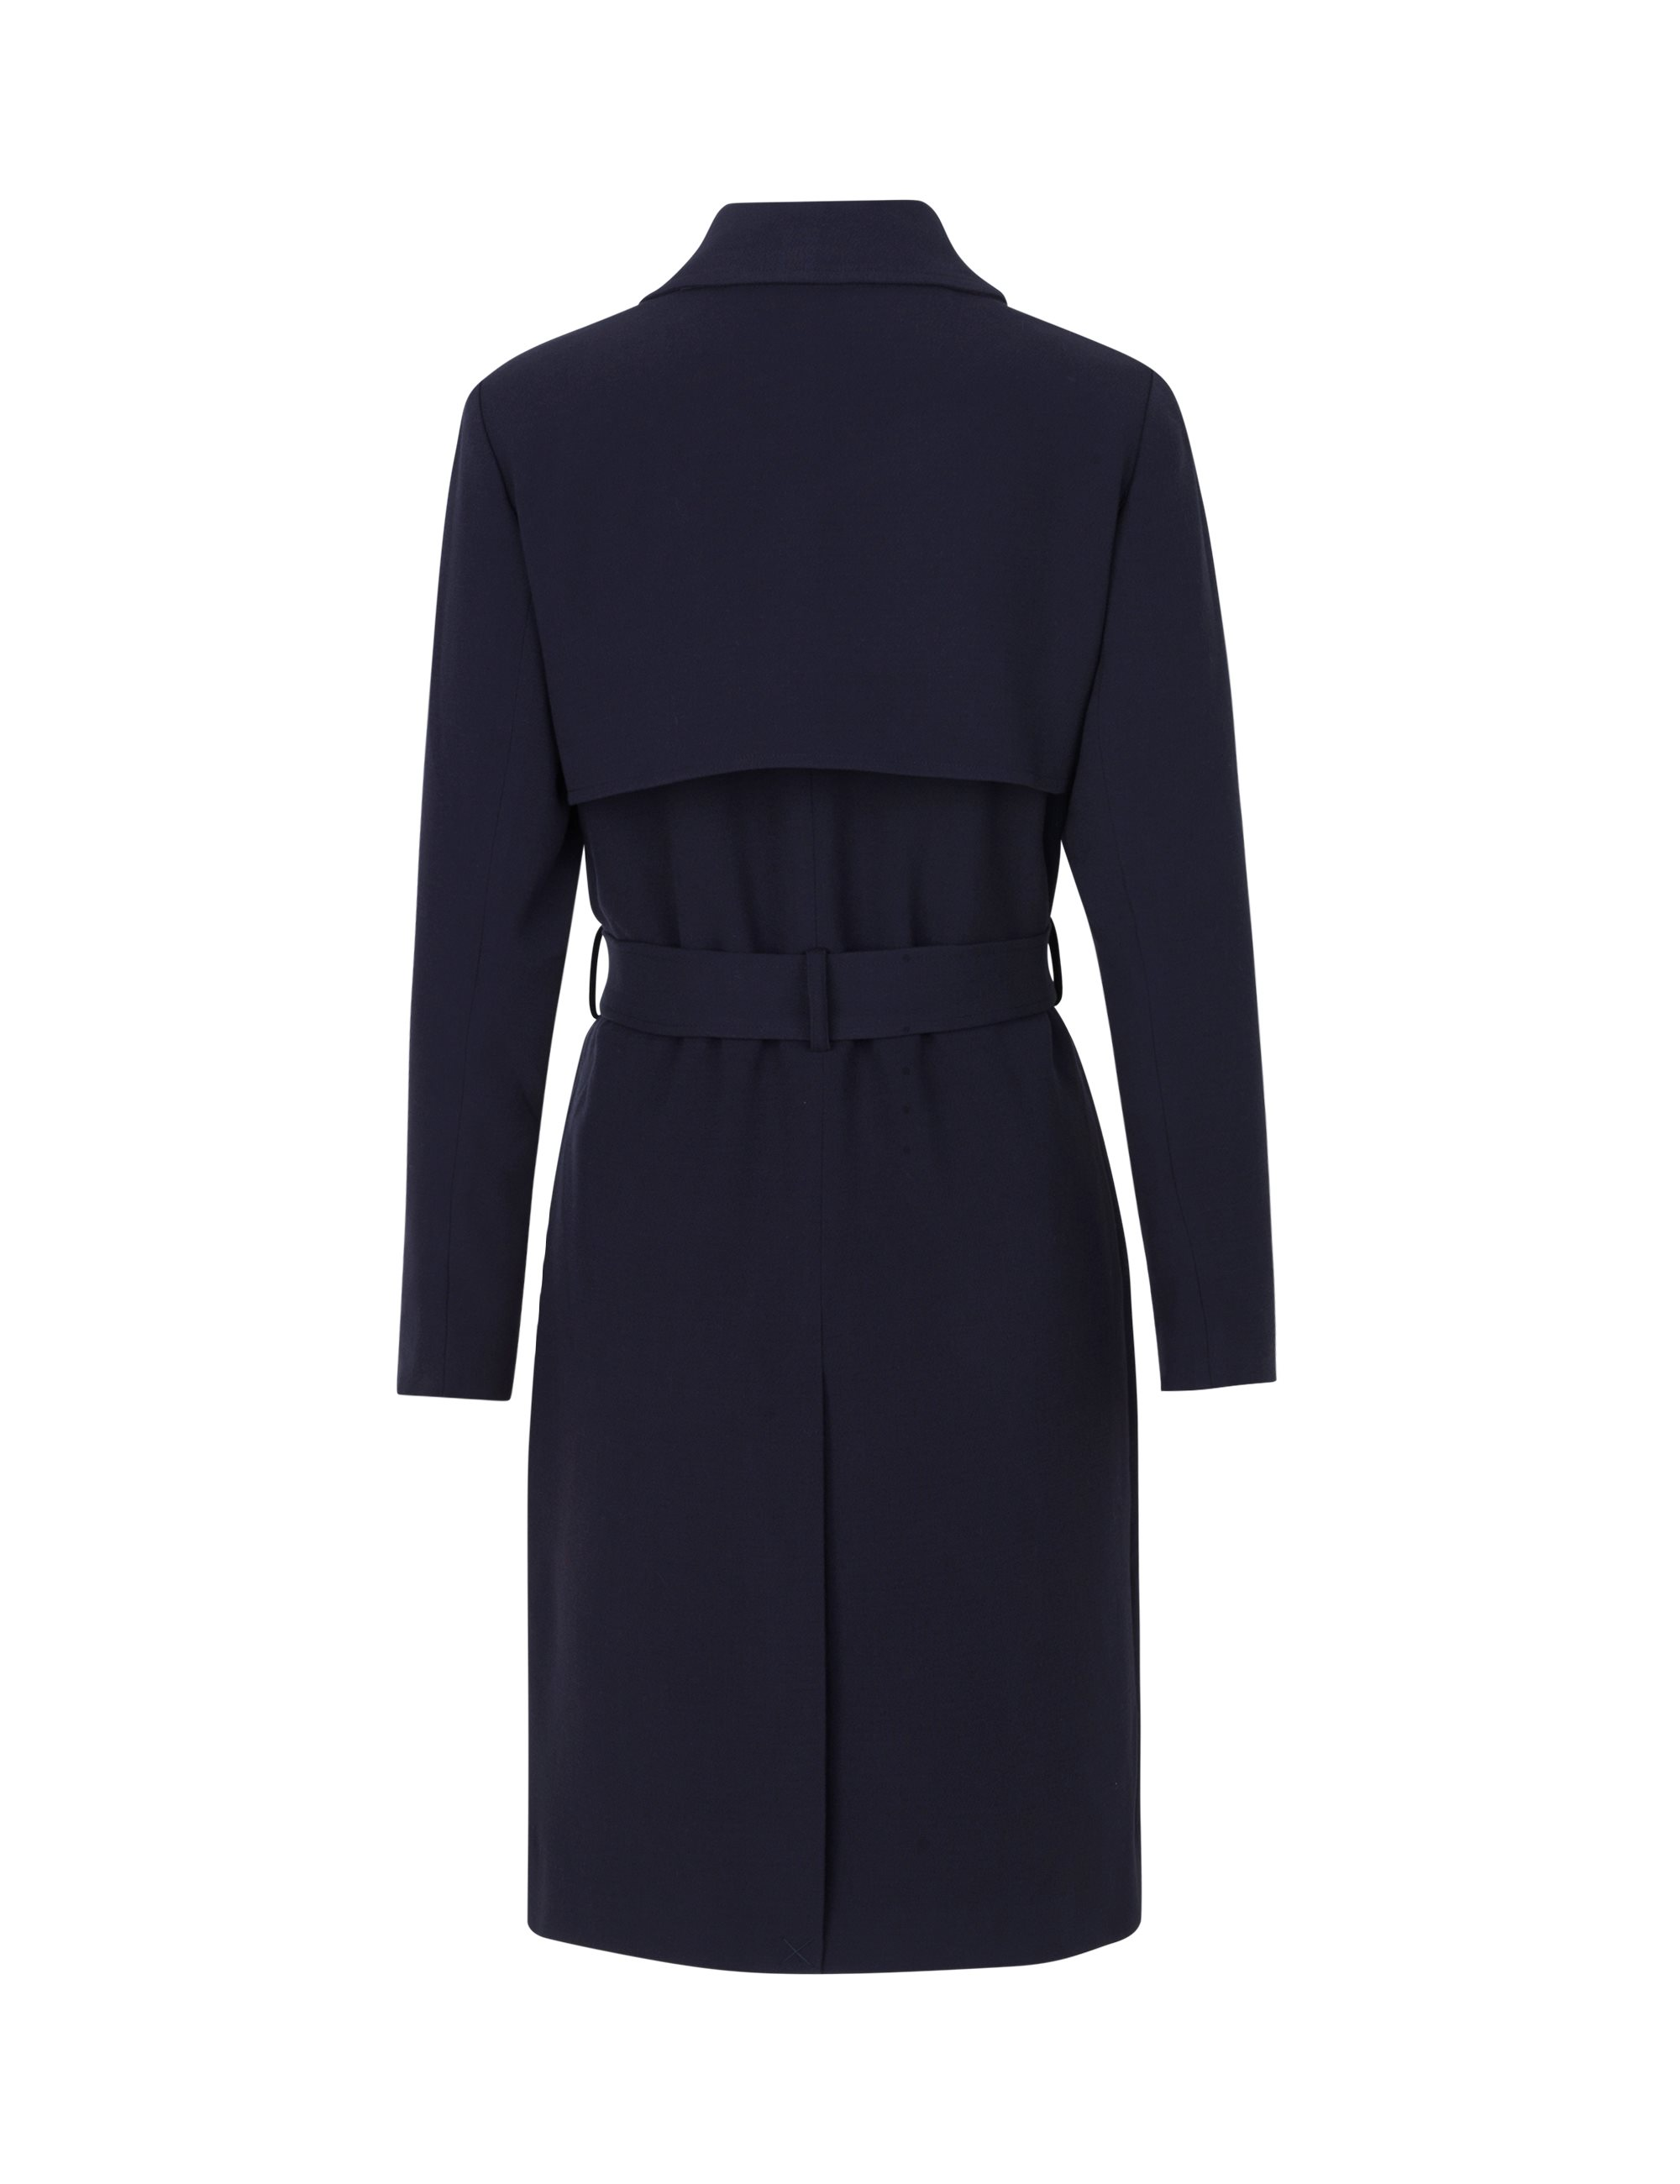 0a45428c6 mbyM Jackets | Women's Jackets & Coats | mbyM Outerwear